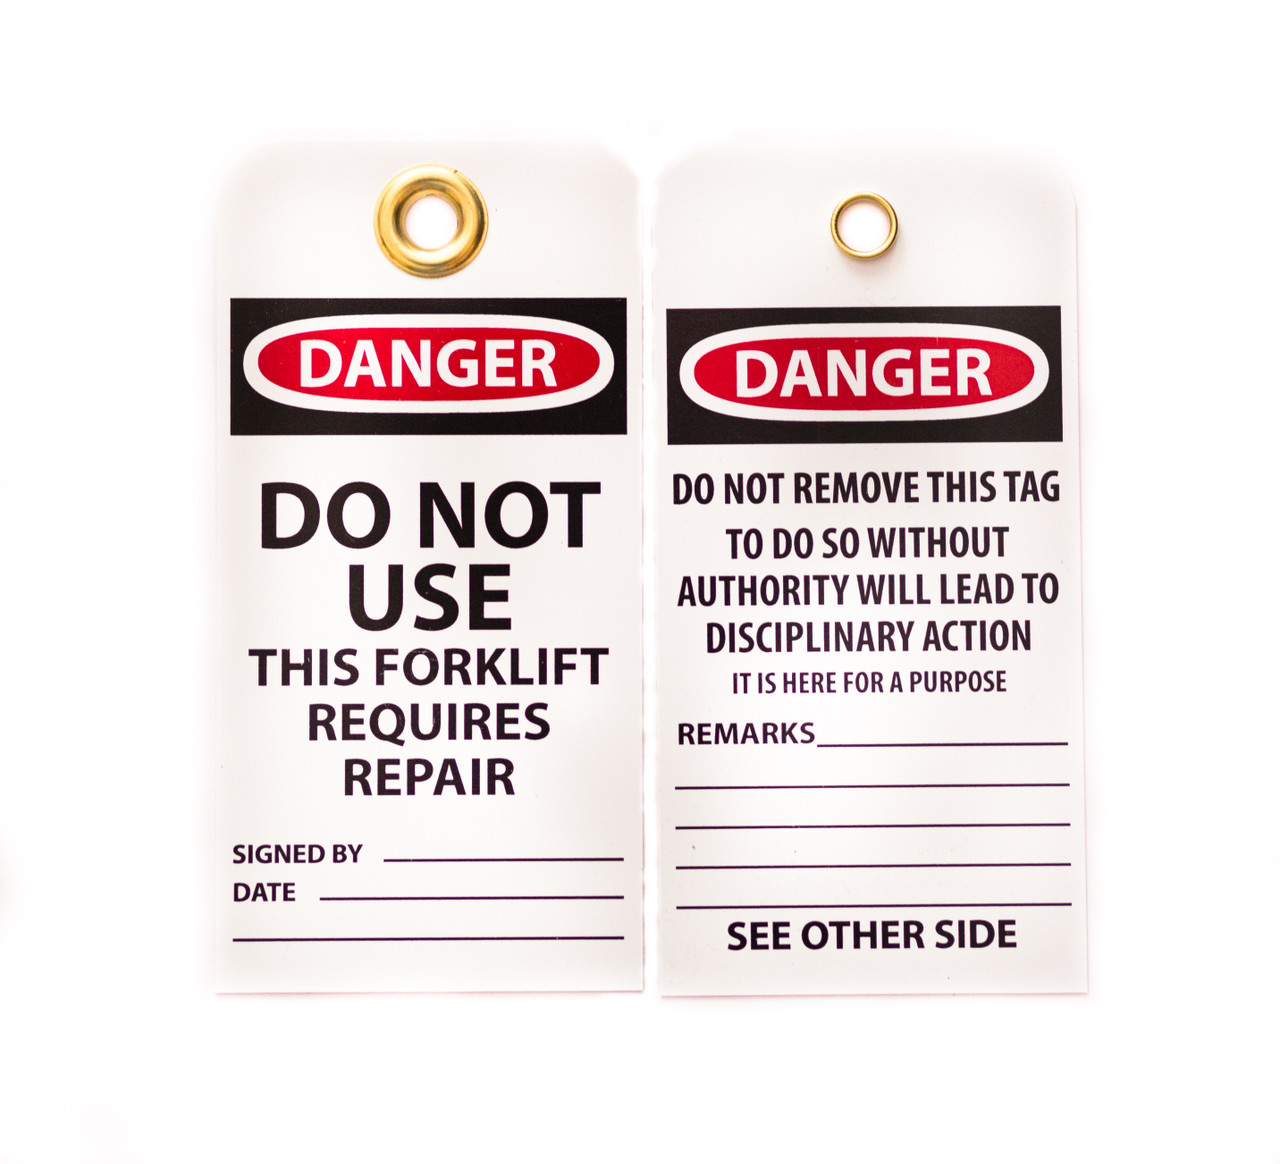 Danger Do Not Use Forklift Lockout Tags